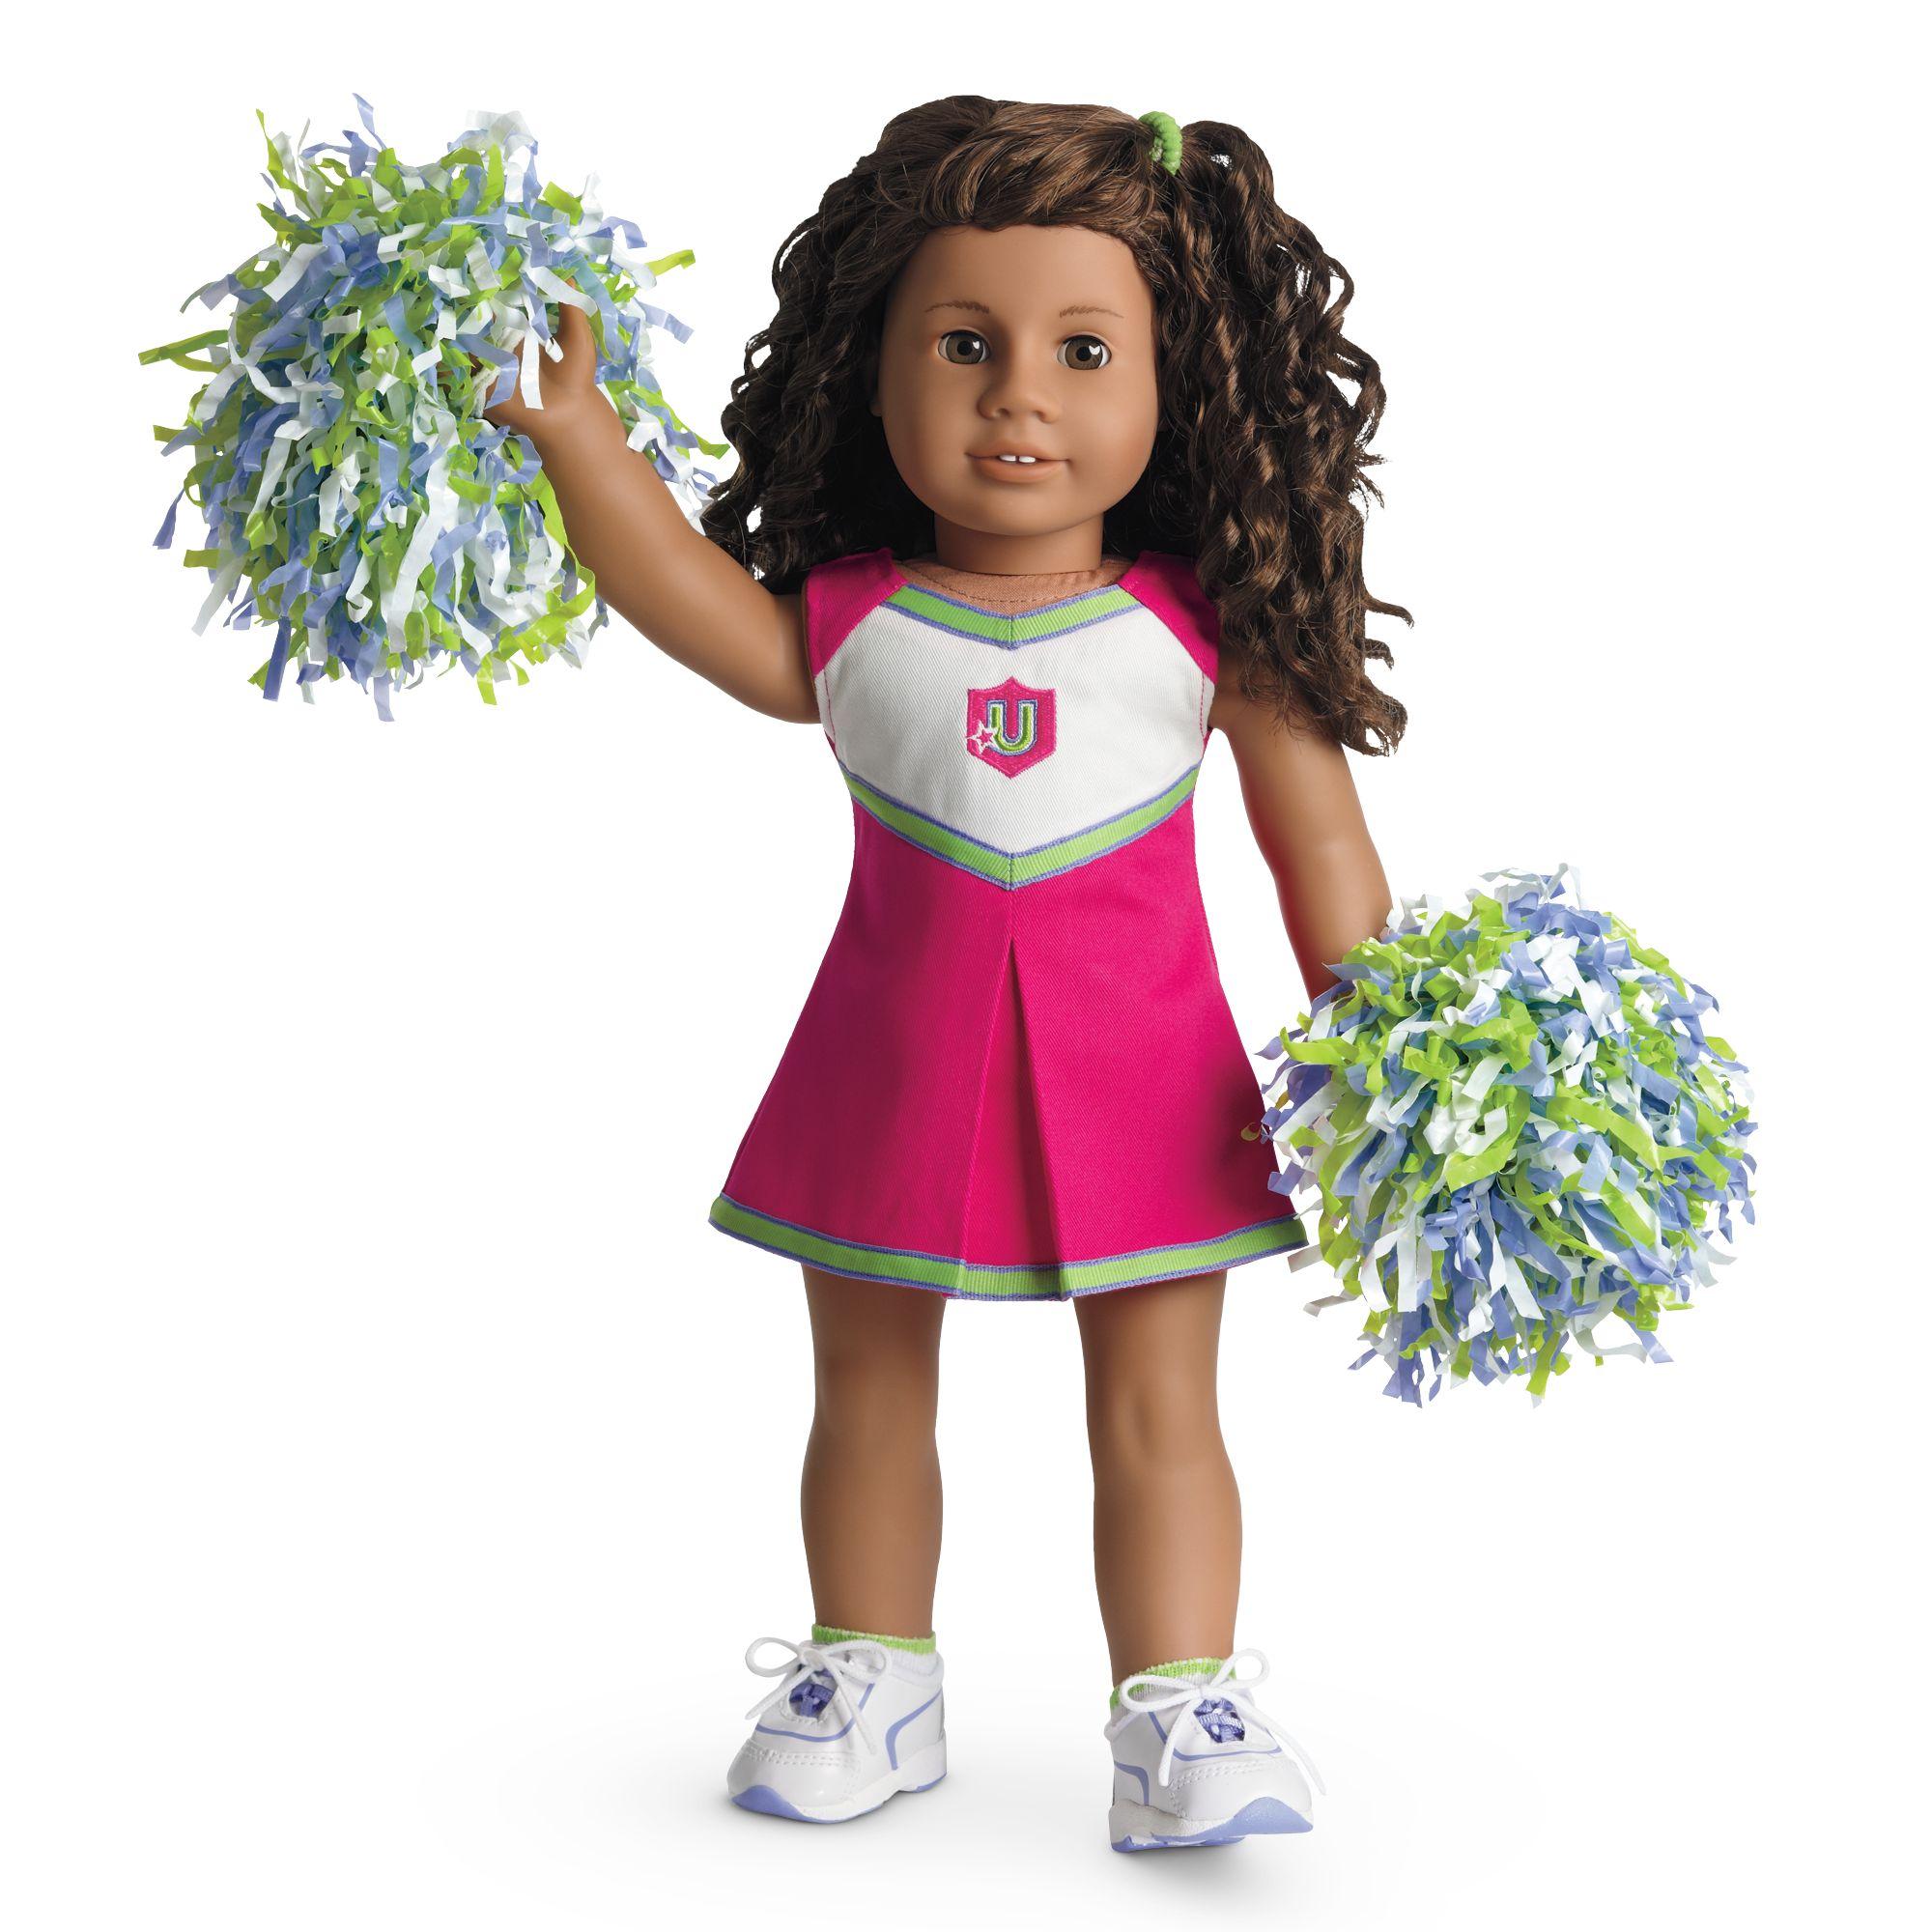 Perfect Campus Cheer Gear | American Girl Wiki | FANDOM powered by Wikia IR27